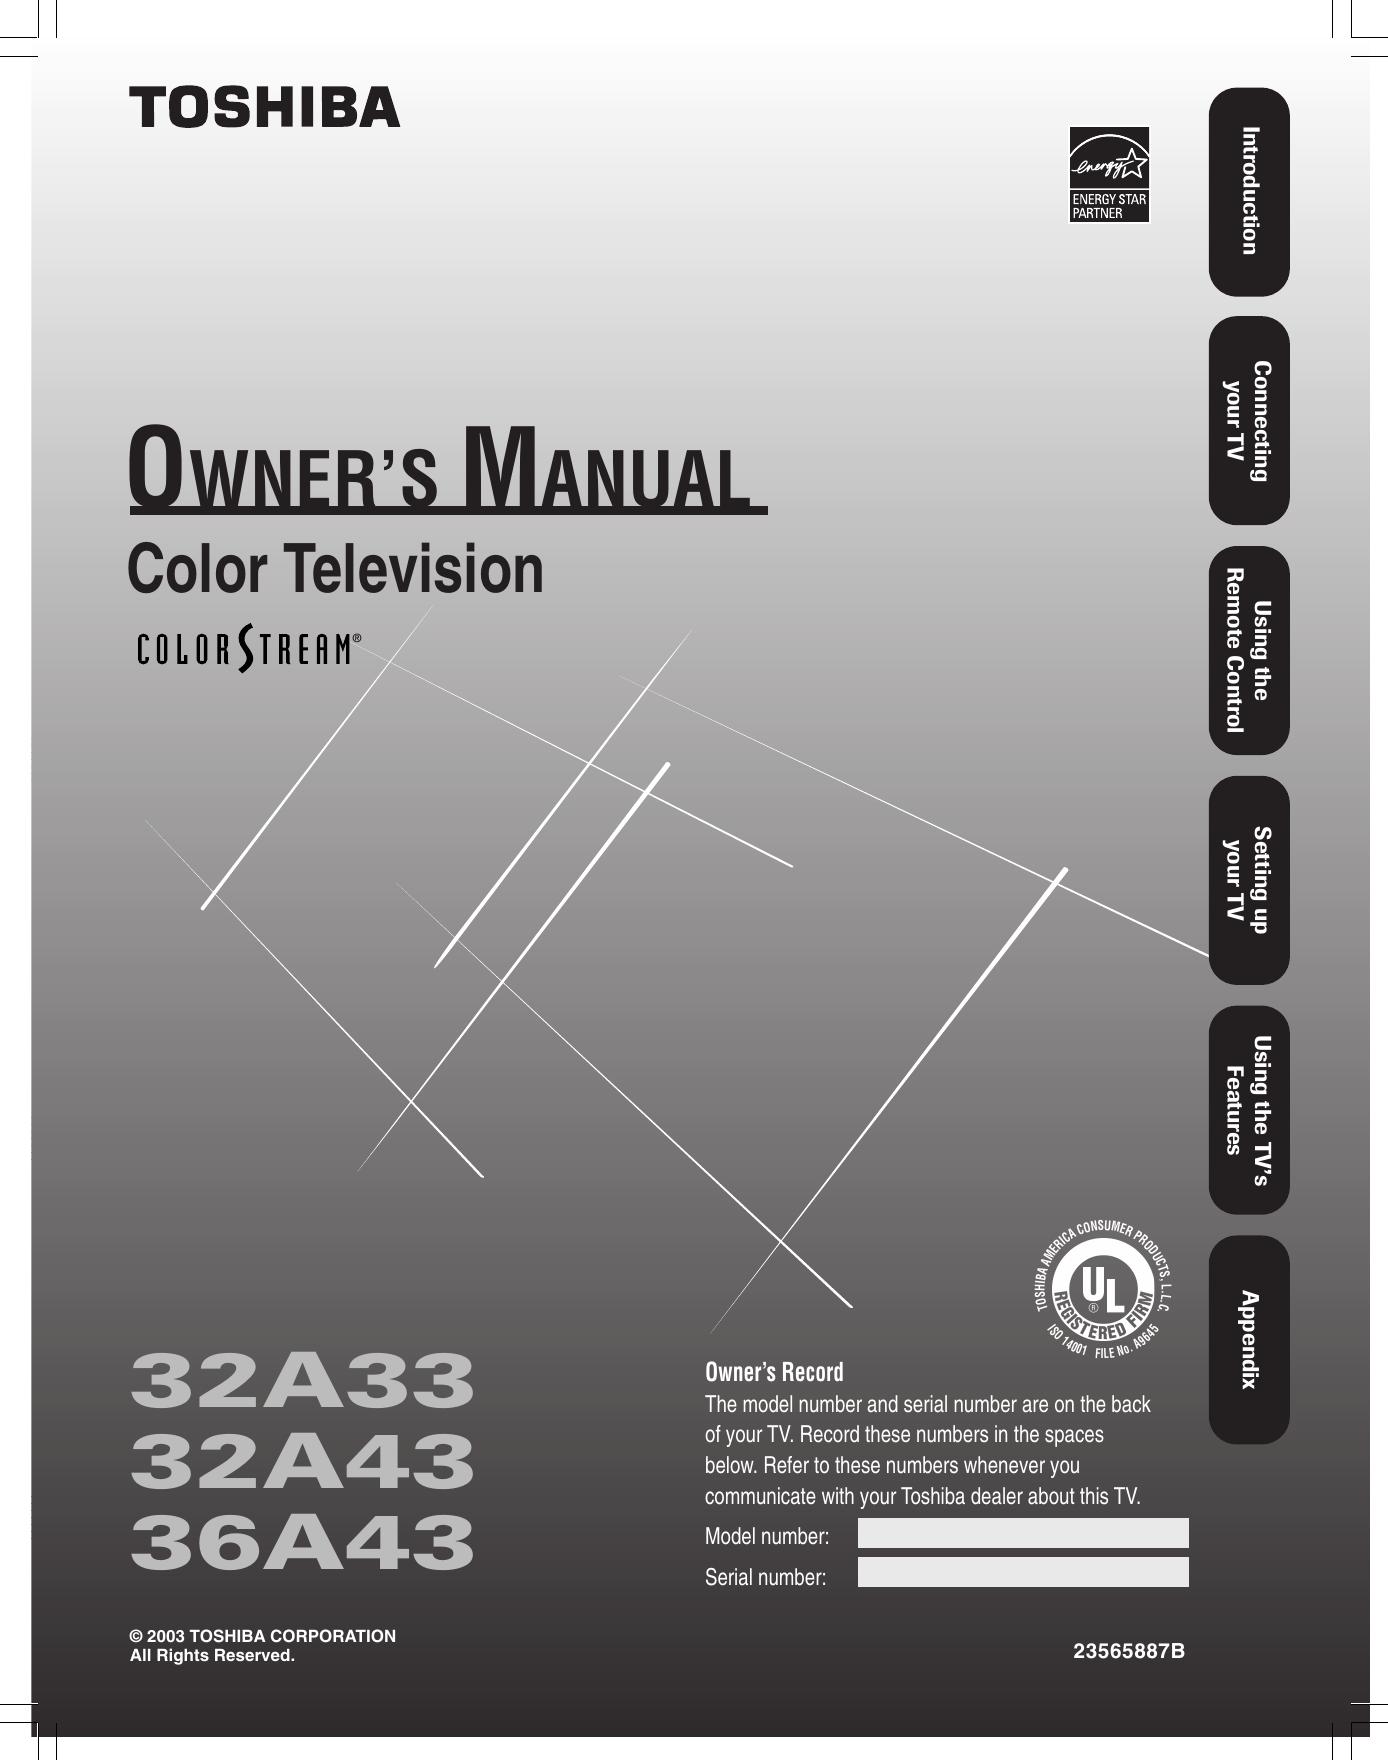 toshiba 32a33 owners manual 32a33 32 36a43 e 01 rev rh usermanual wiki RCA User Manual Garmin GPS User Manual